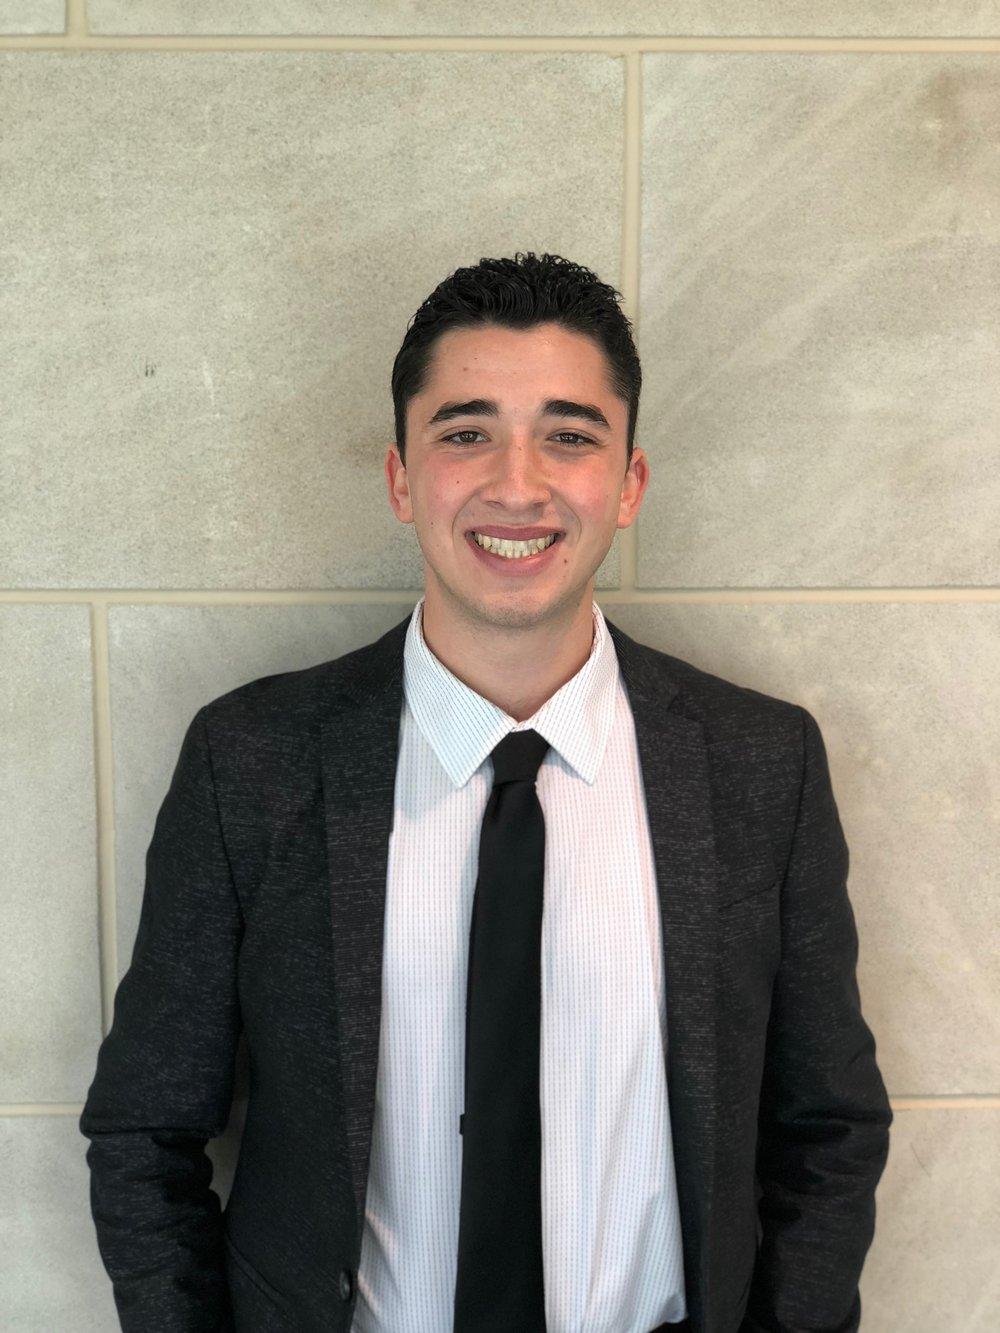 Alexander Radick '21   Vice President of Finance  Miami Beach, FL   Alr299@cornell.edu